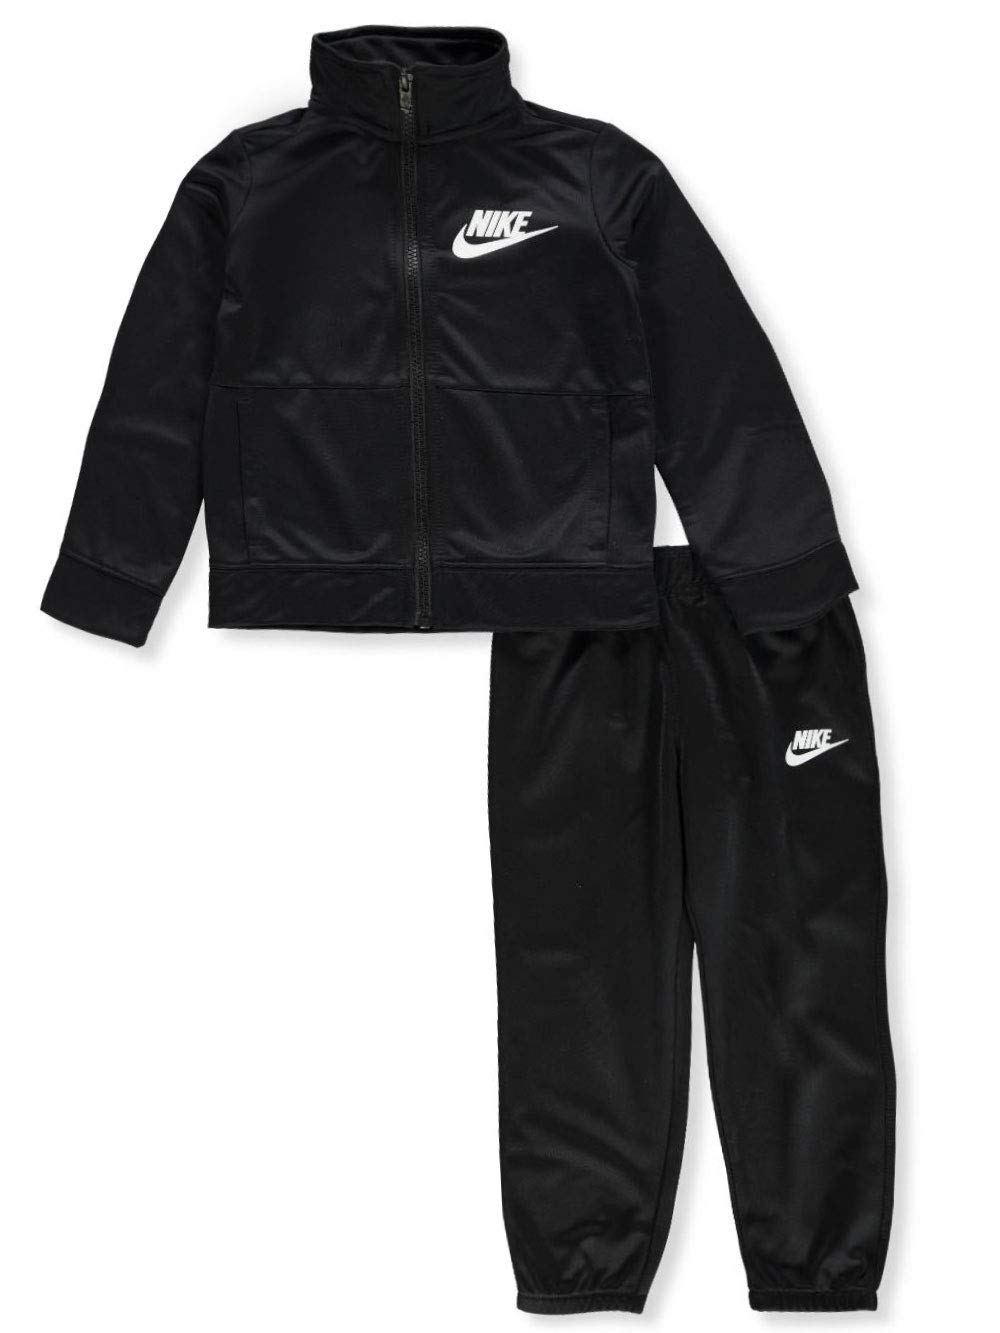 Nike Boys' 2-Piece Tricot Tracksuit Pants Set Outfit - Black, 3t